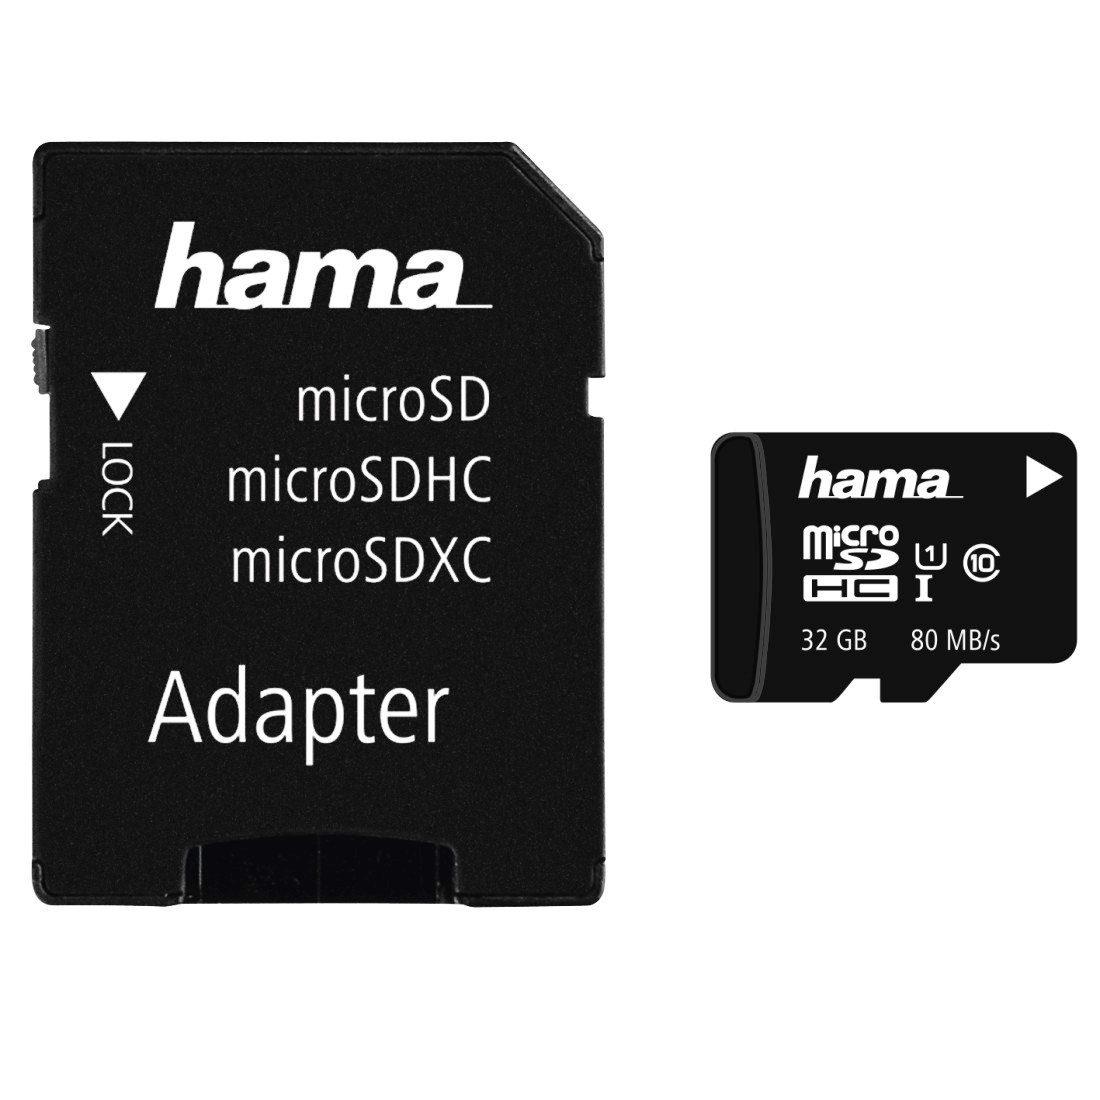 Hama microSDHC 32GB Class 10 UHS-I 80MB/s + Adapter/Mobile